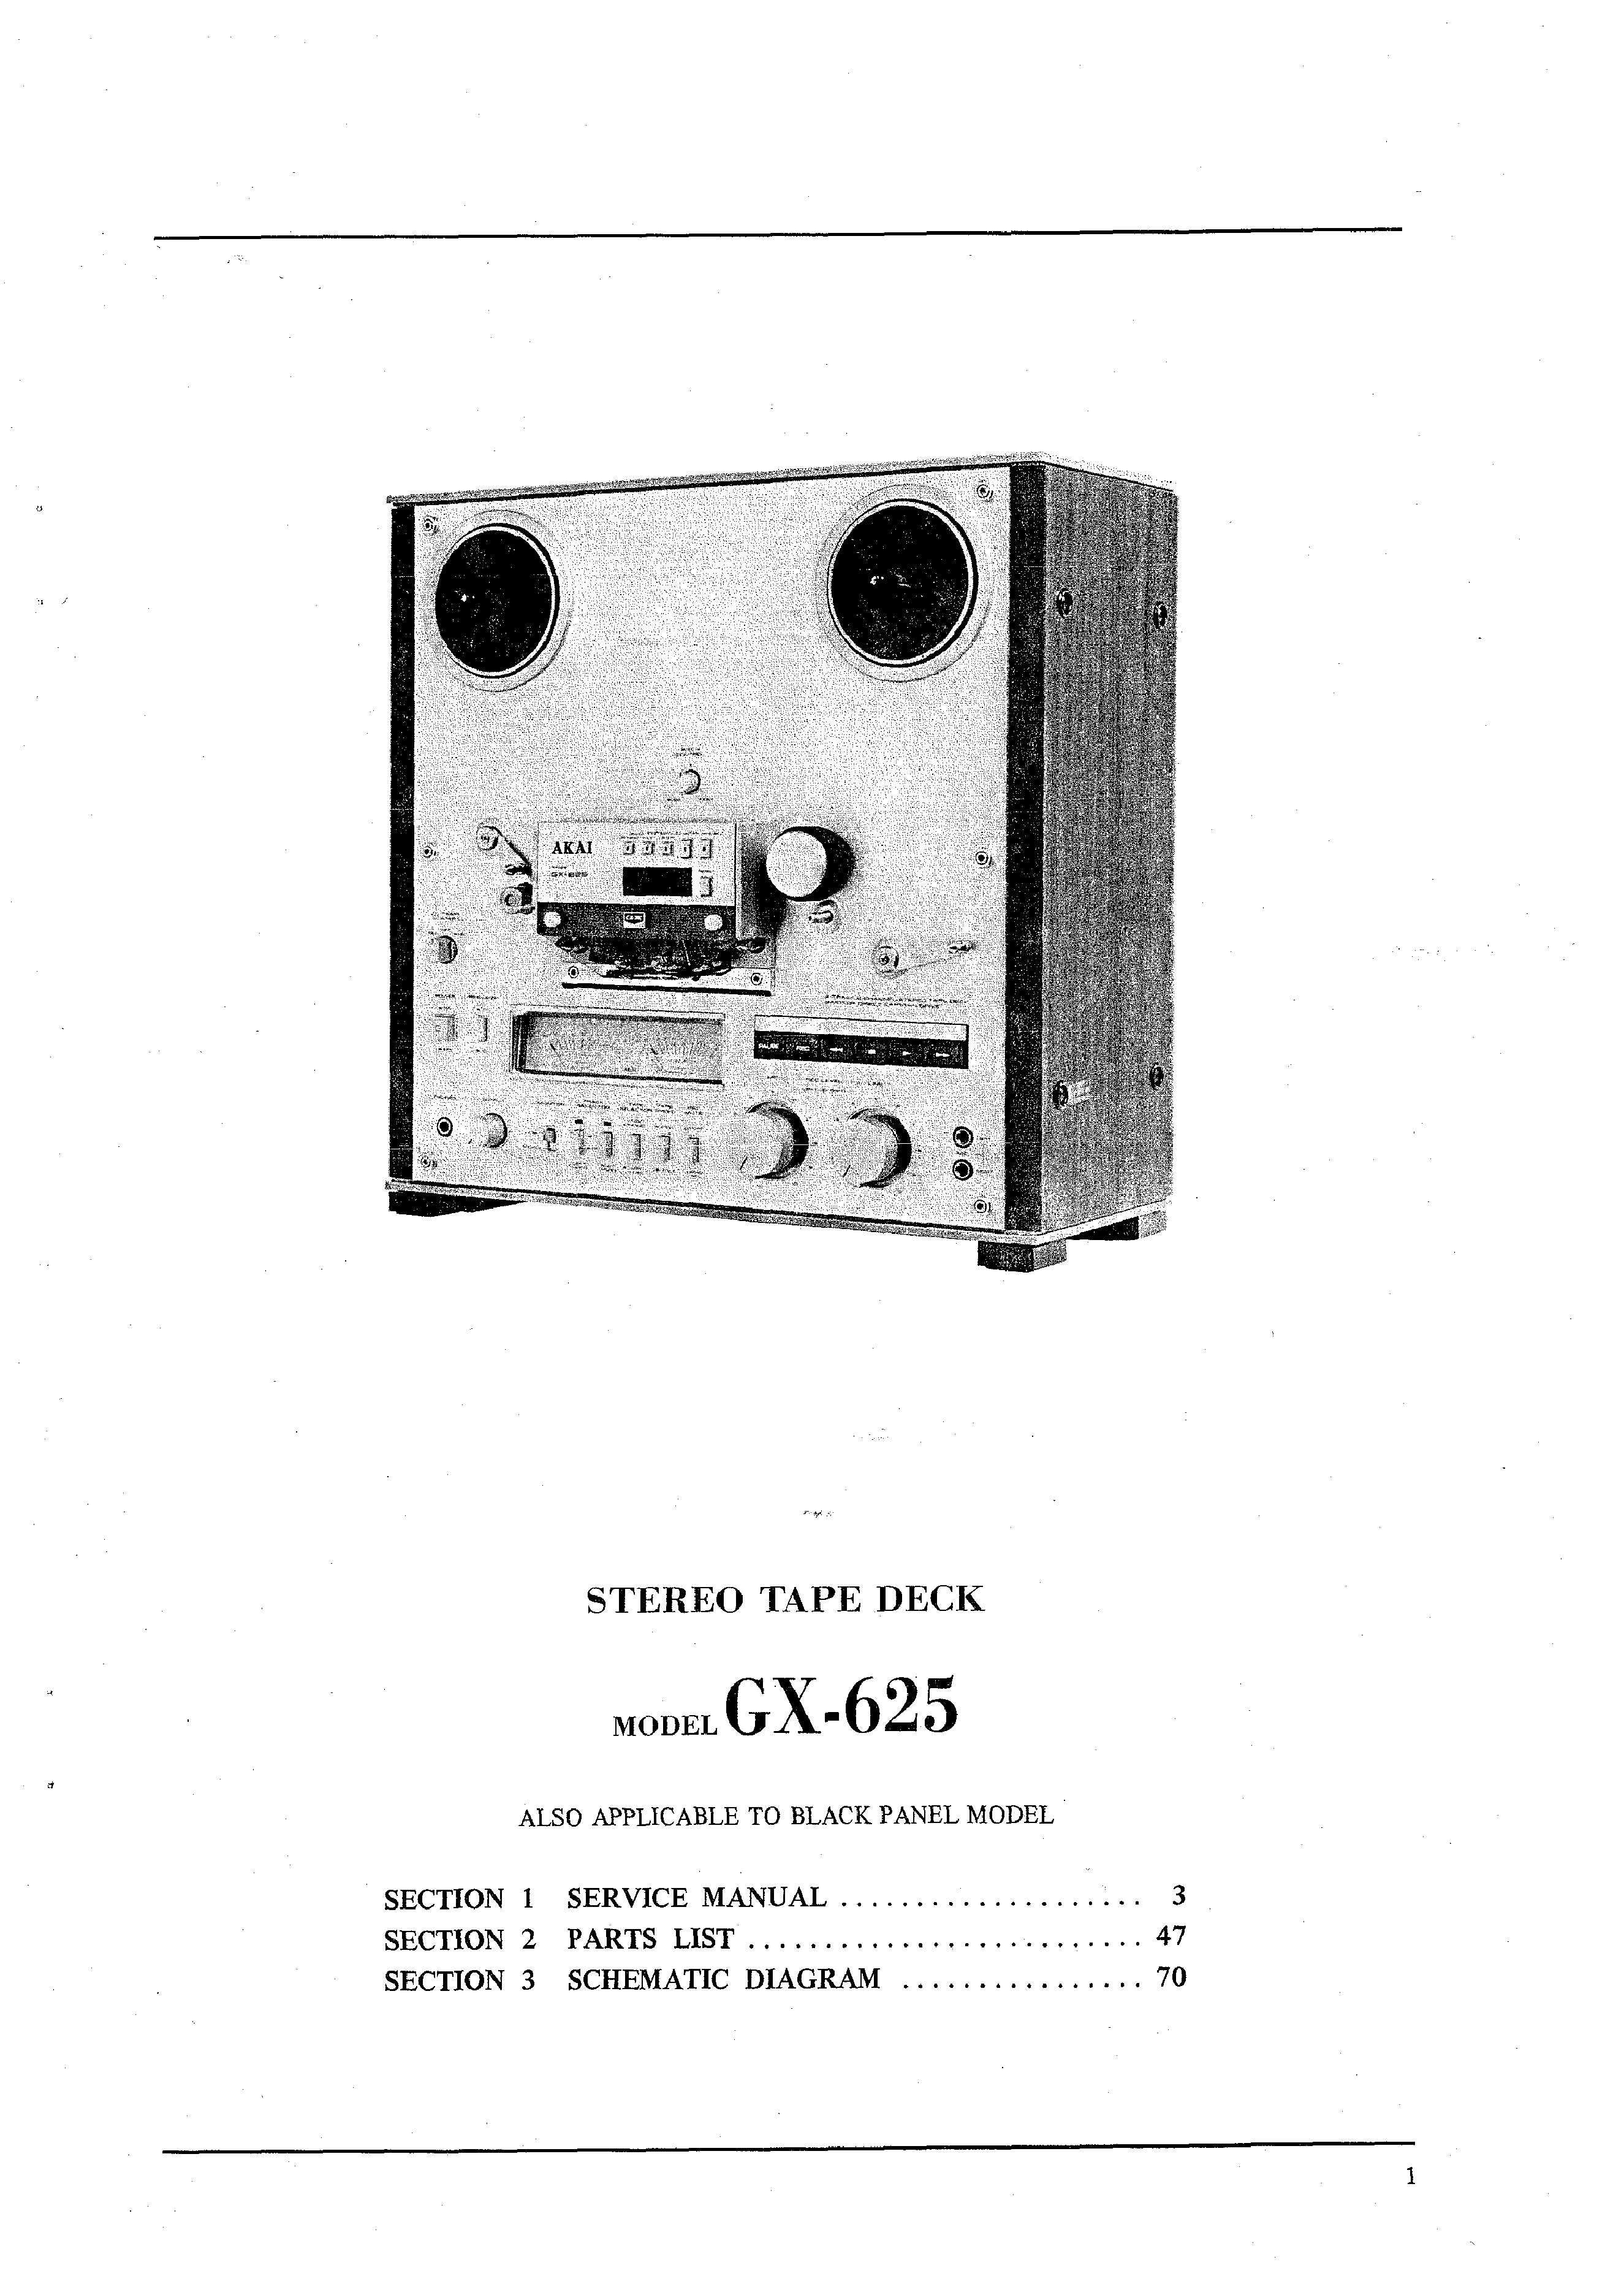 Service Manual For Akai Gx-625